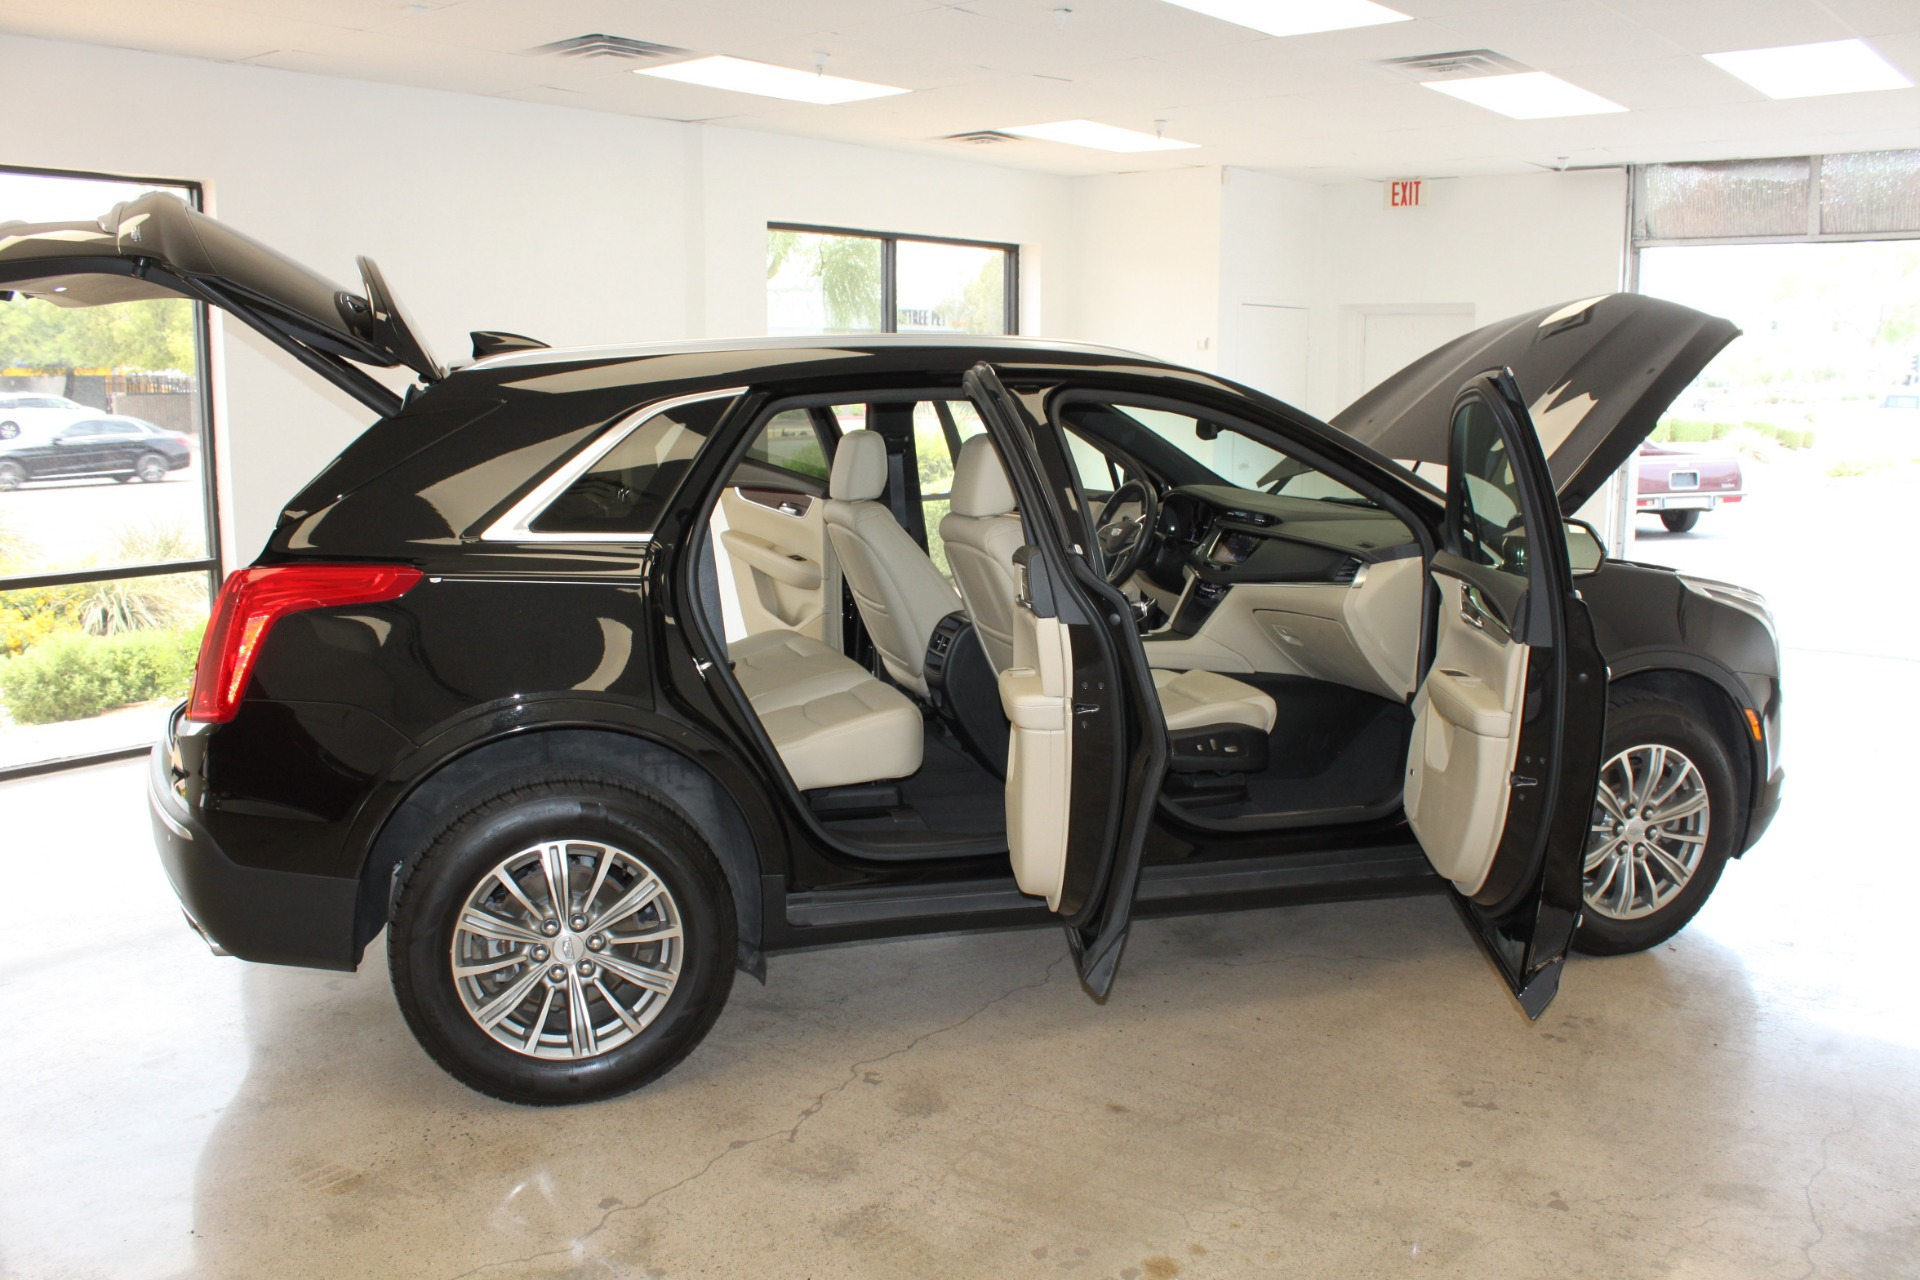 Used-2017-Cadillac-XT5-Luxury-All-Wheel-Drive-Luxury-AWD-Lamborghini